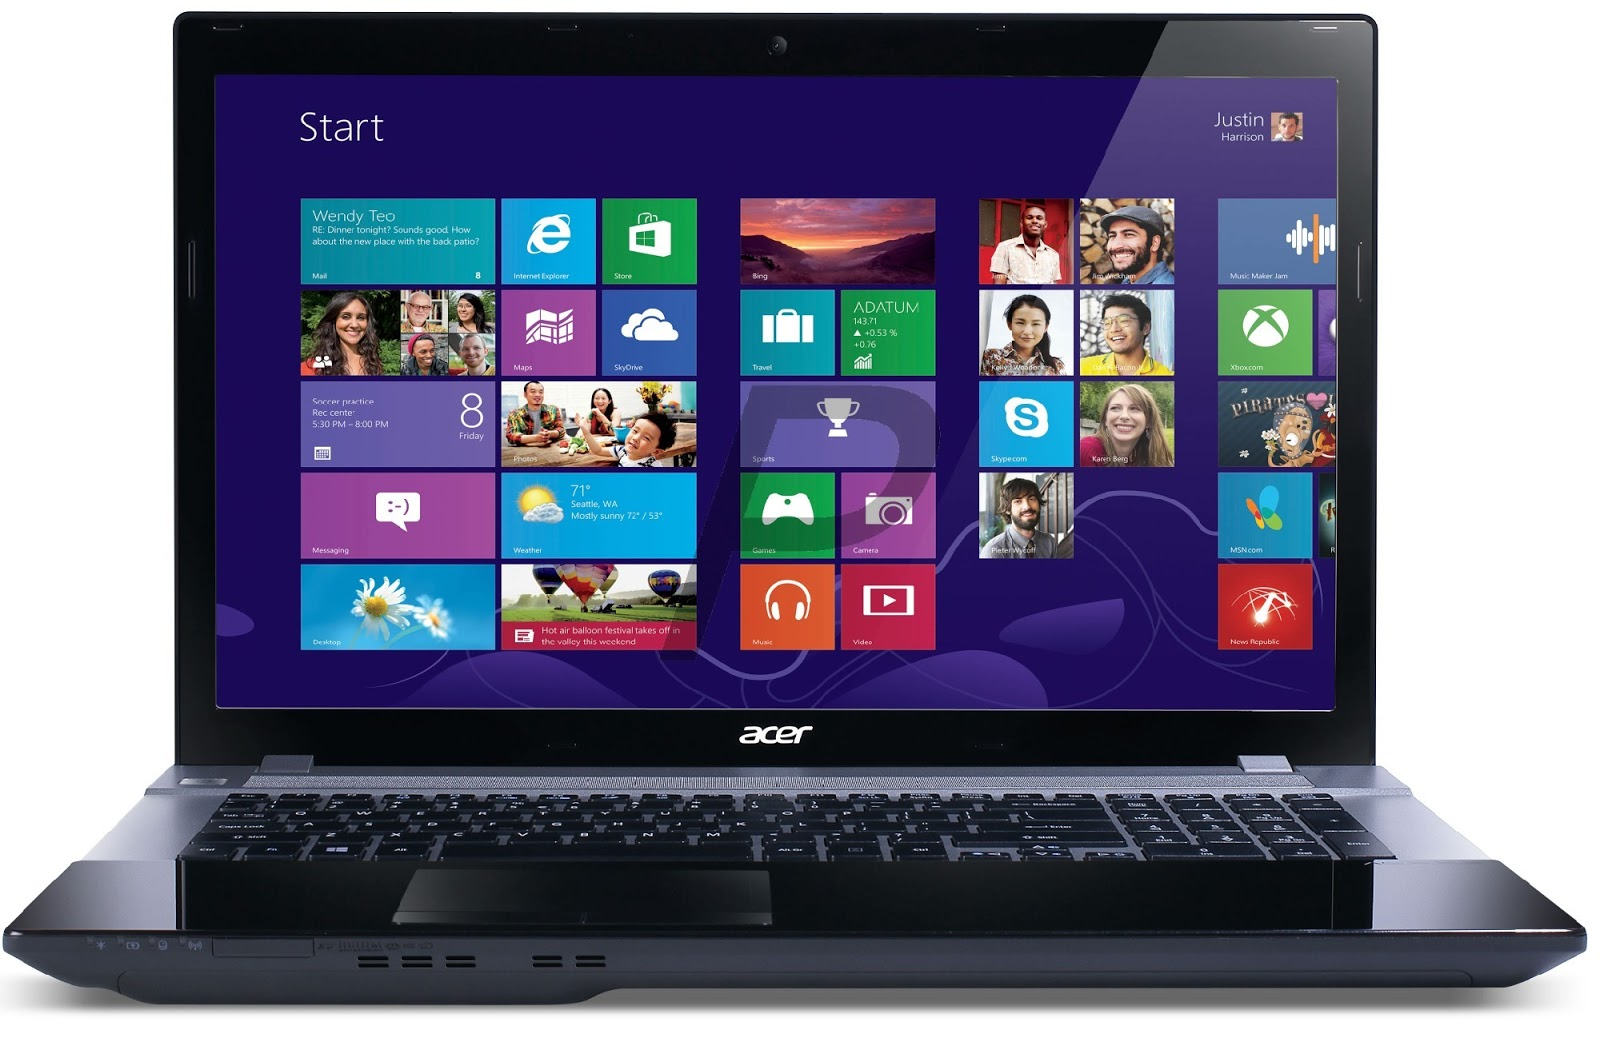 Harga Laptop Acer Aspire V3 772G 747A321 Terbaru 2013